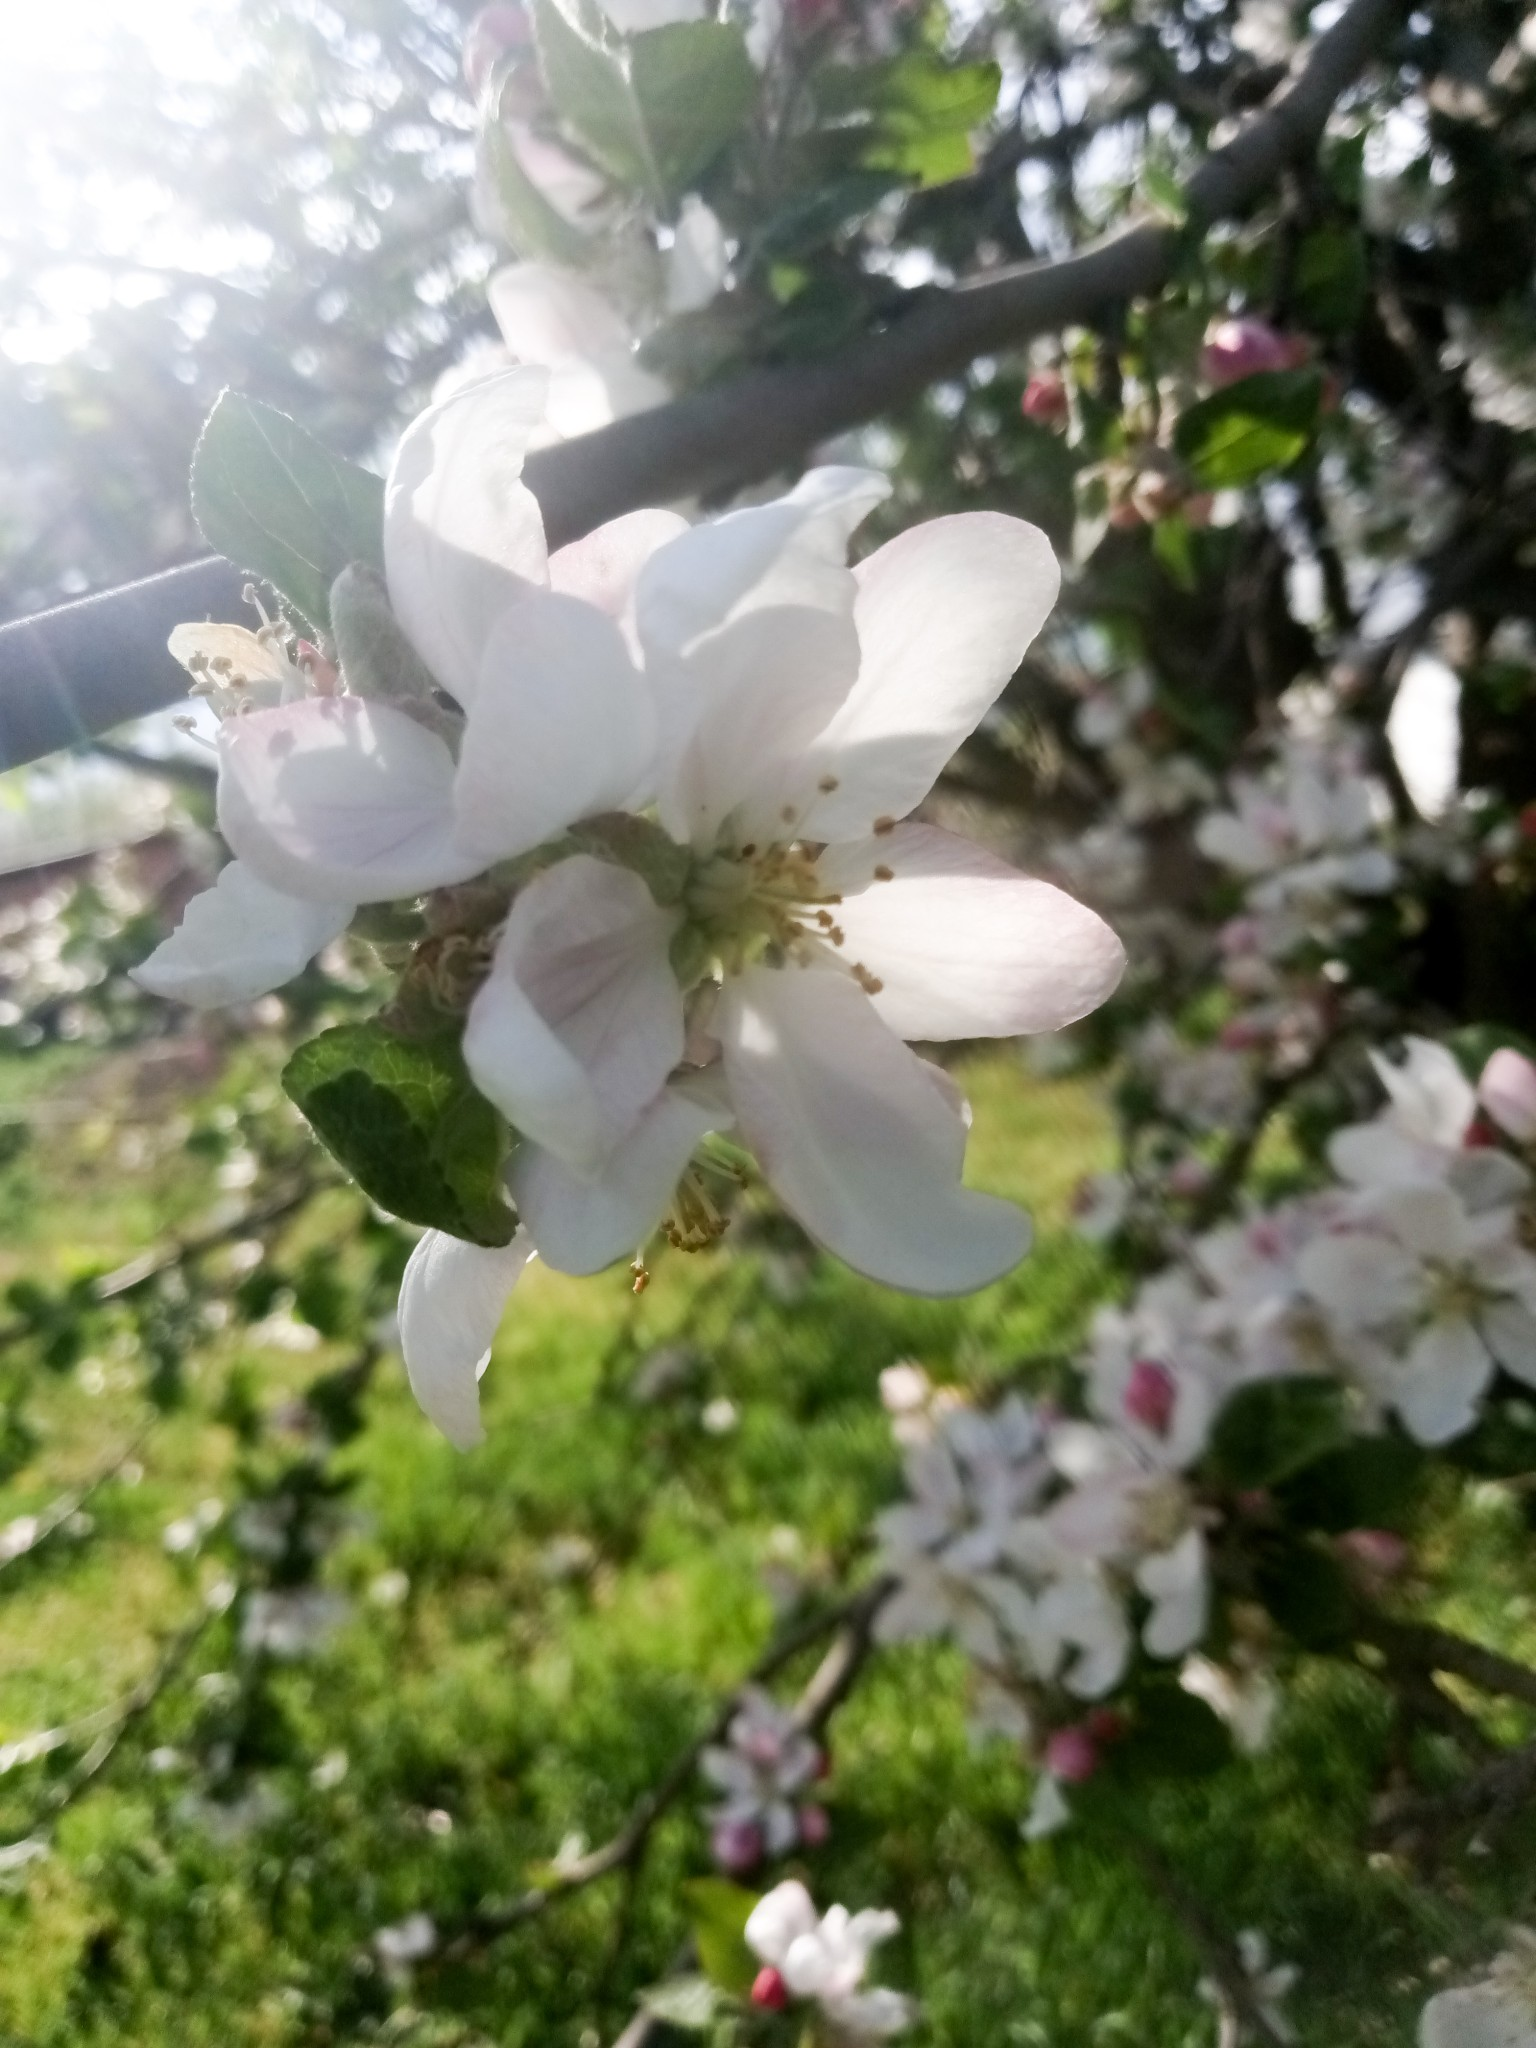 flowering apple tree - beautiful photo